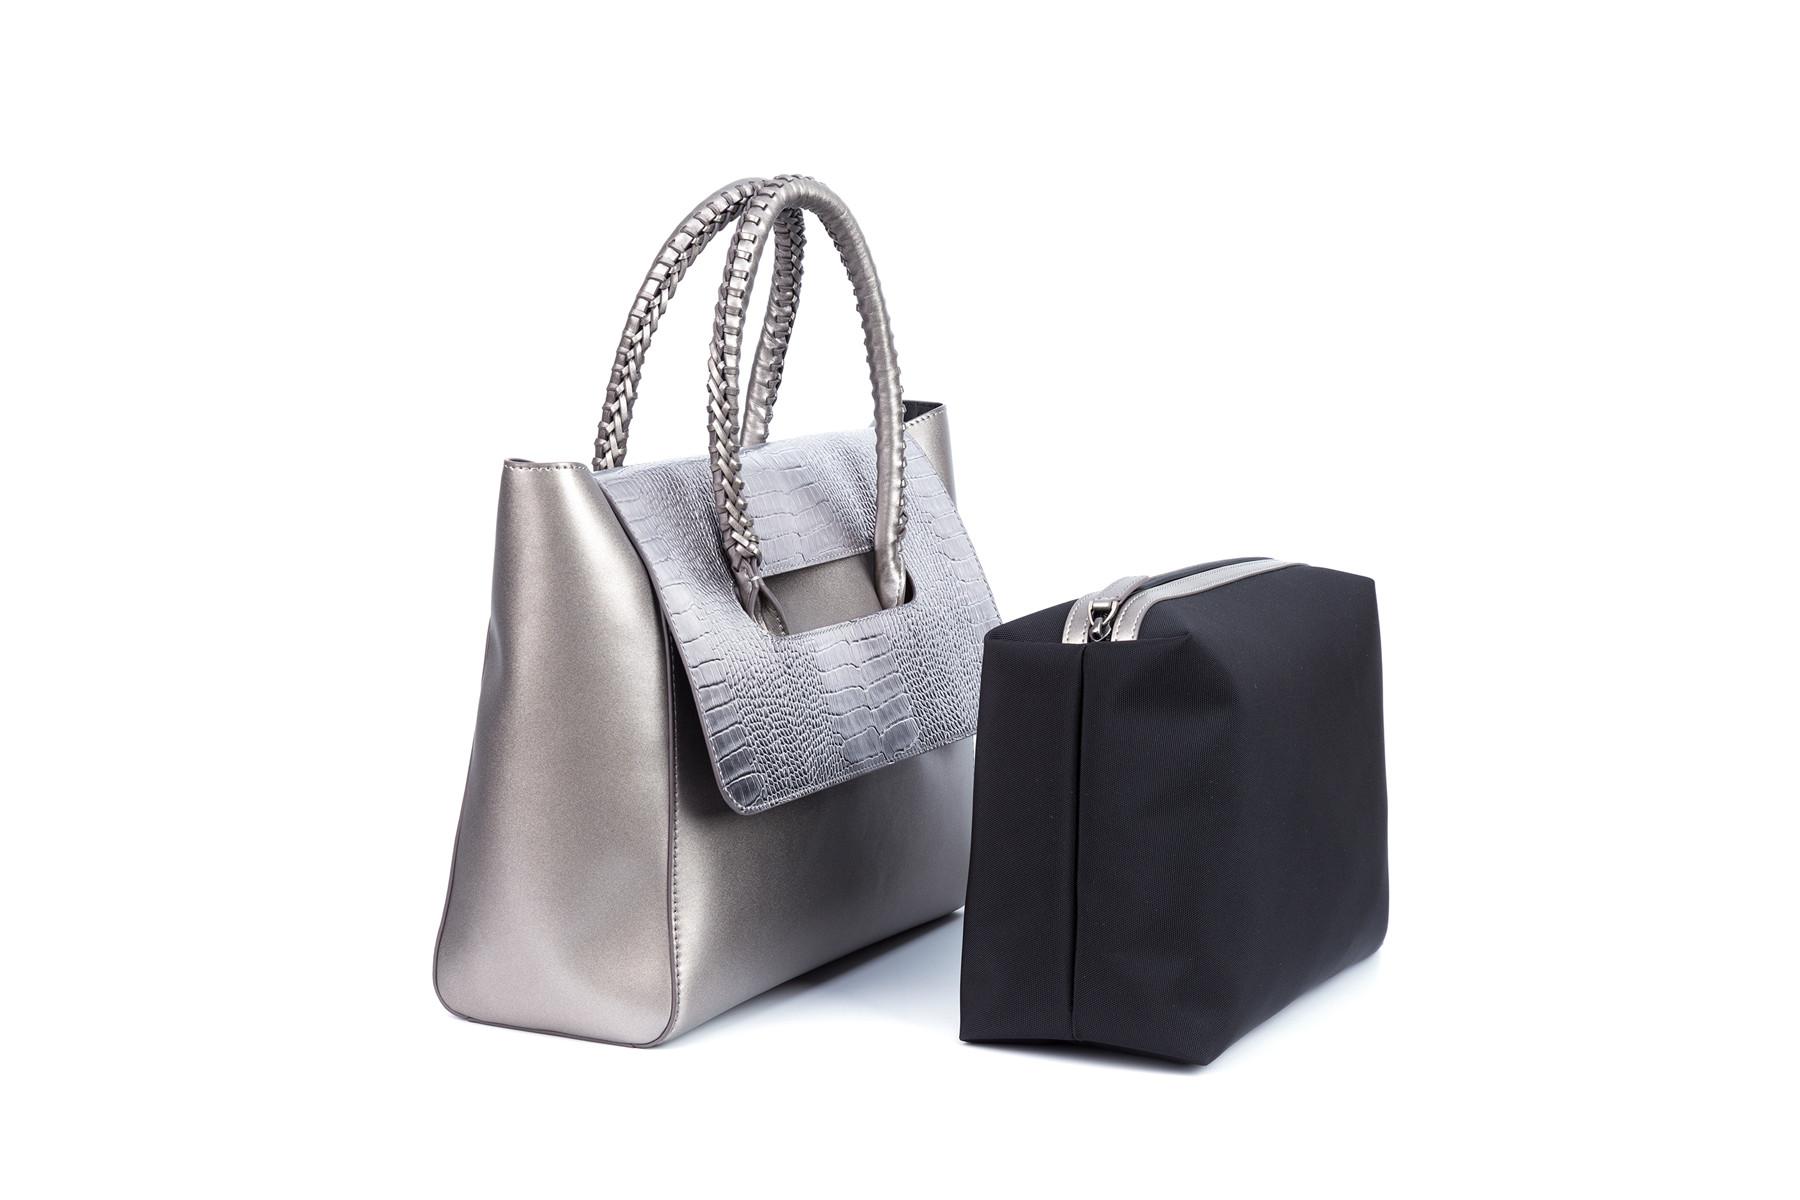 GF bags-Bulk Luxury Handbags Manufacturer, Affordable Handbags   Gf Bags-3